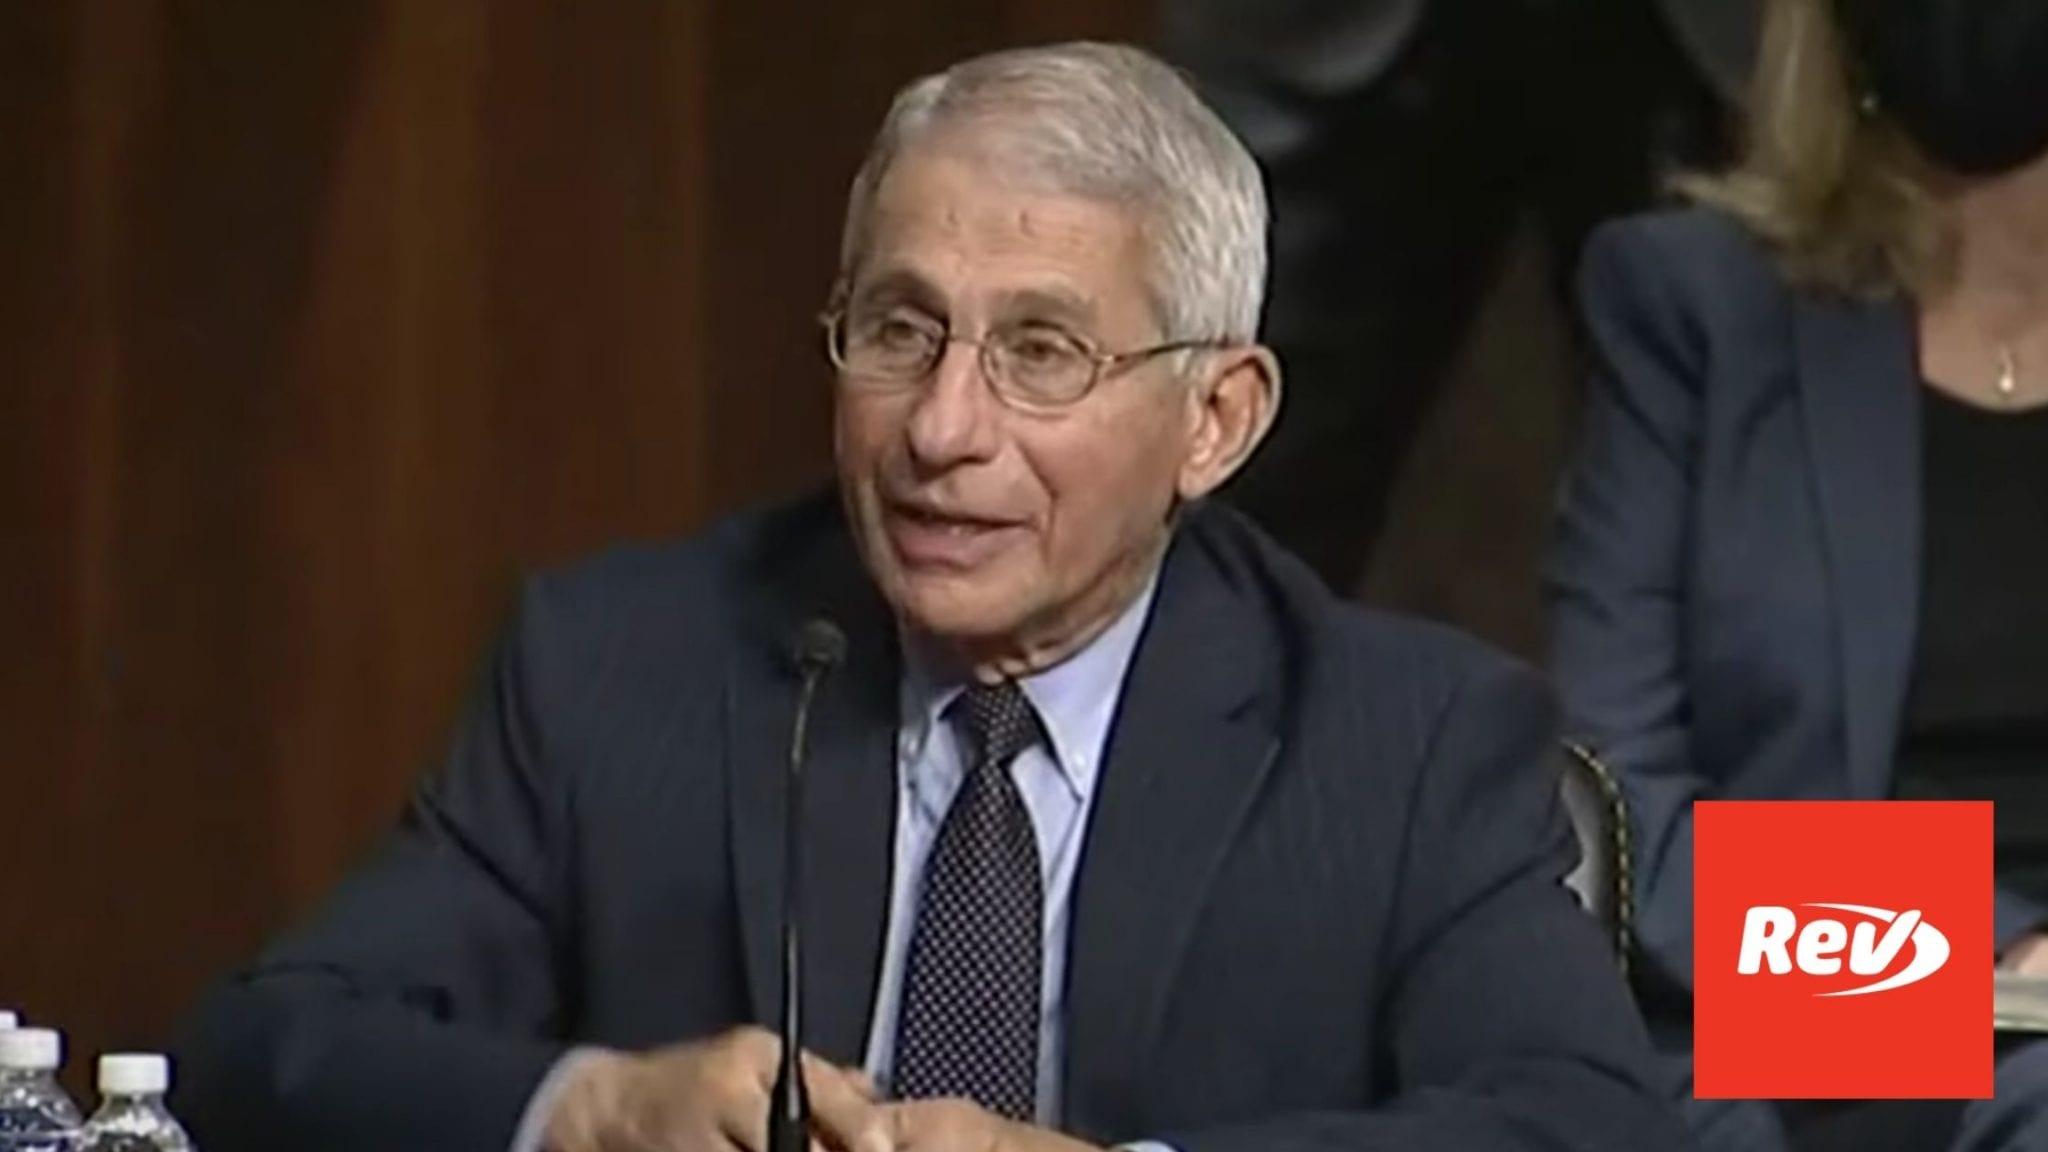 Fauci, Redfield COVID-19 Testimony Before Senate Transcript September 23